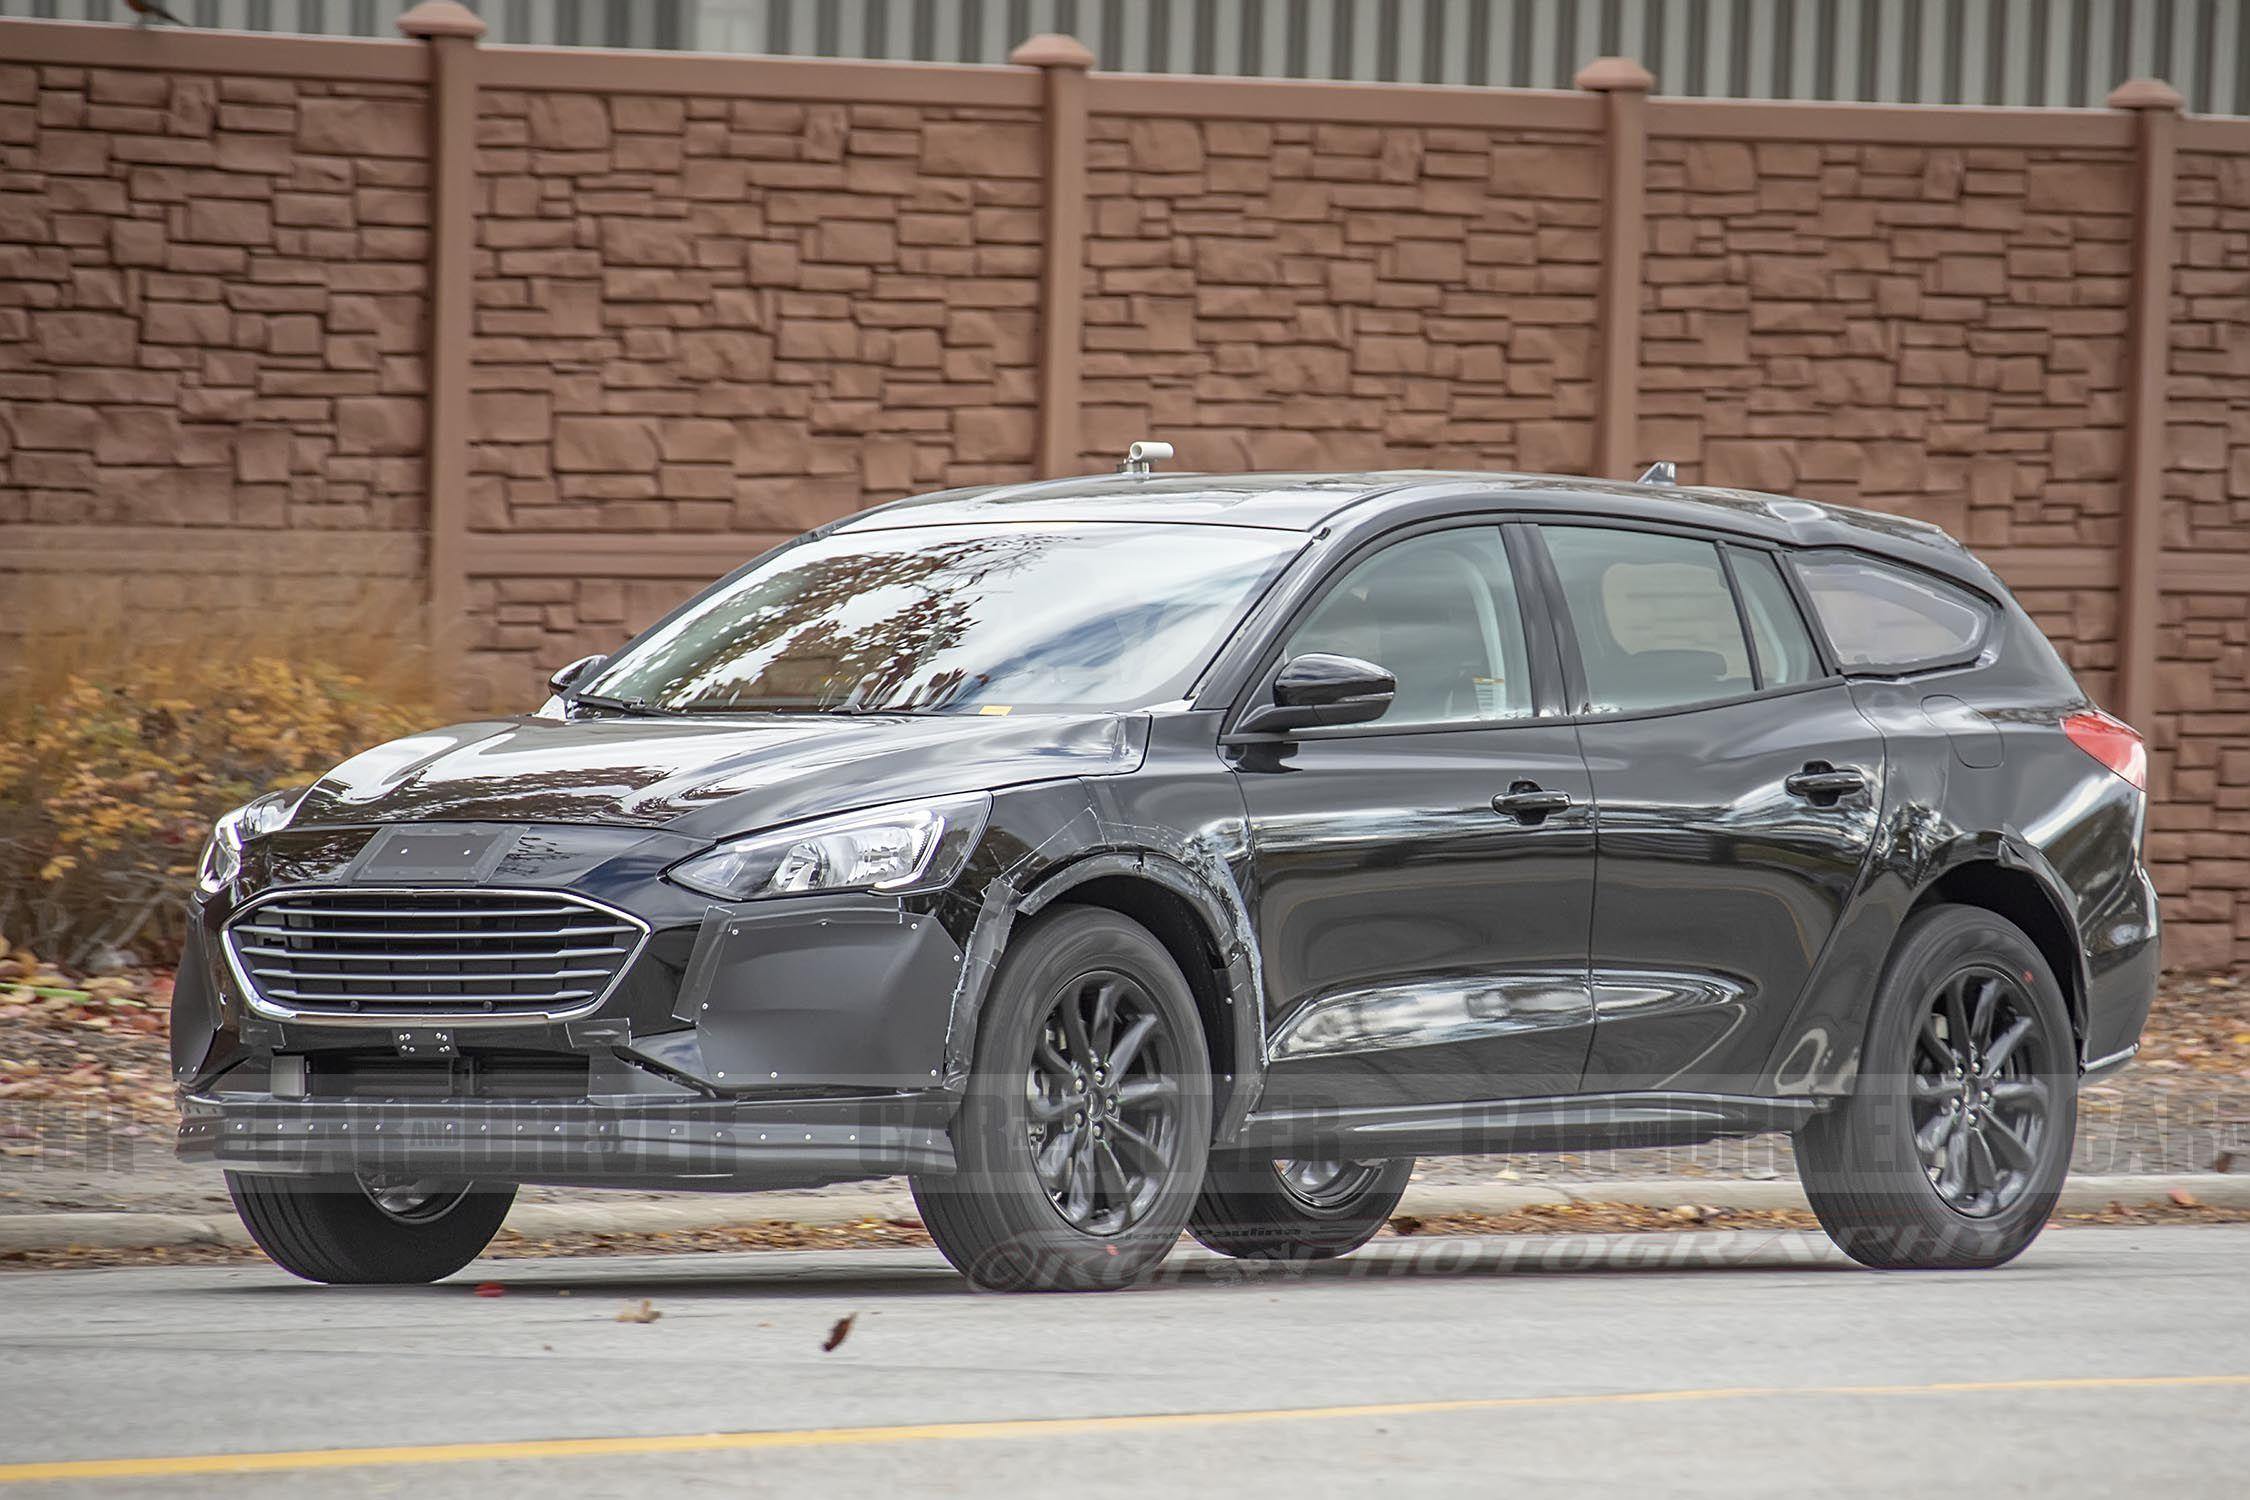 Next Ford Fusion Takes Shape As A Subaru Outback–Style